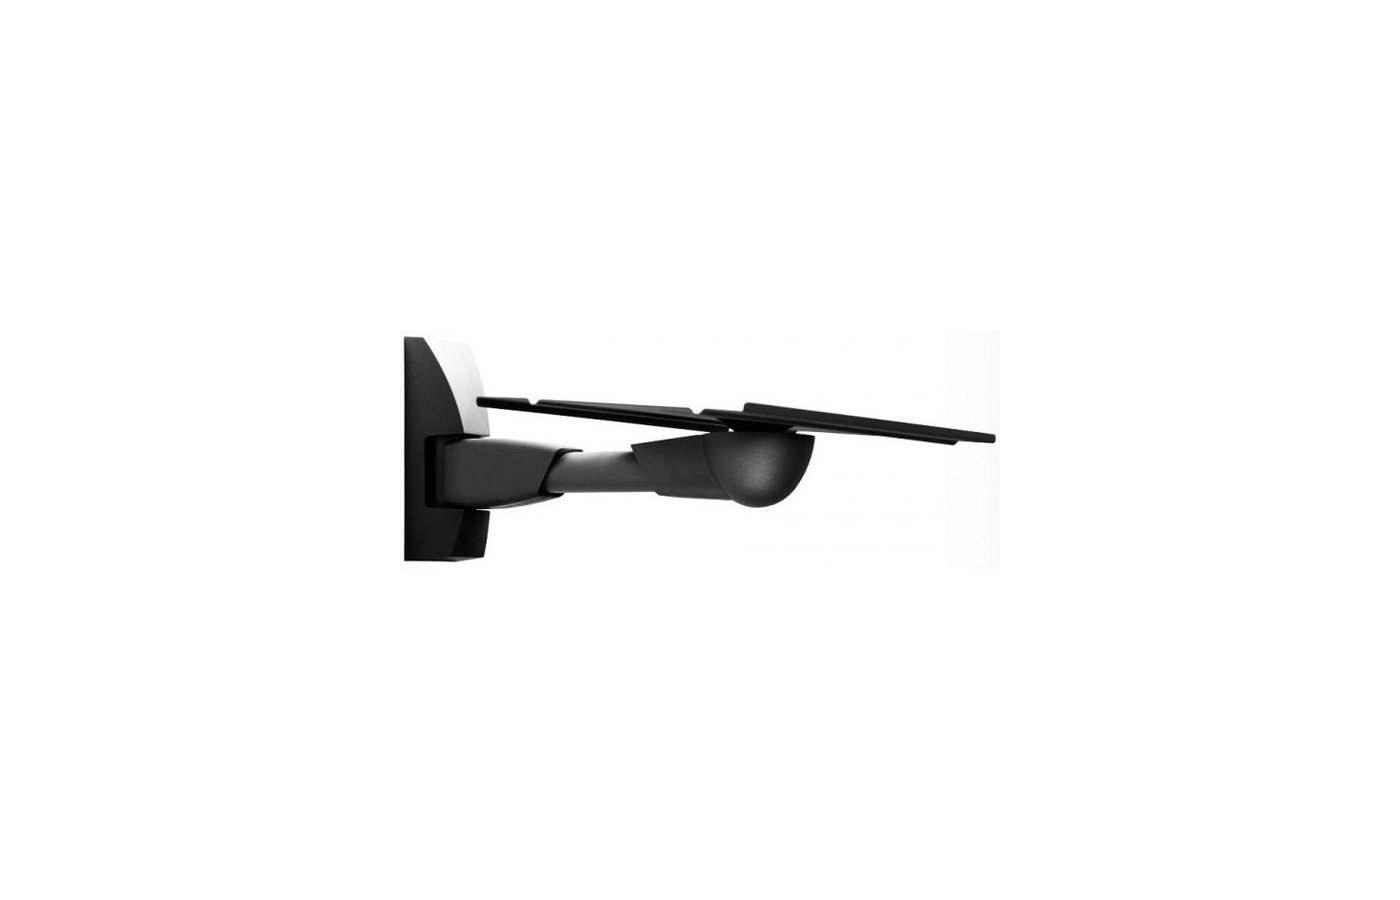 Кронштейн для телевизоров Holder TV Support TVS-1154 (черный) ТВ 51-63см.